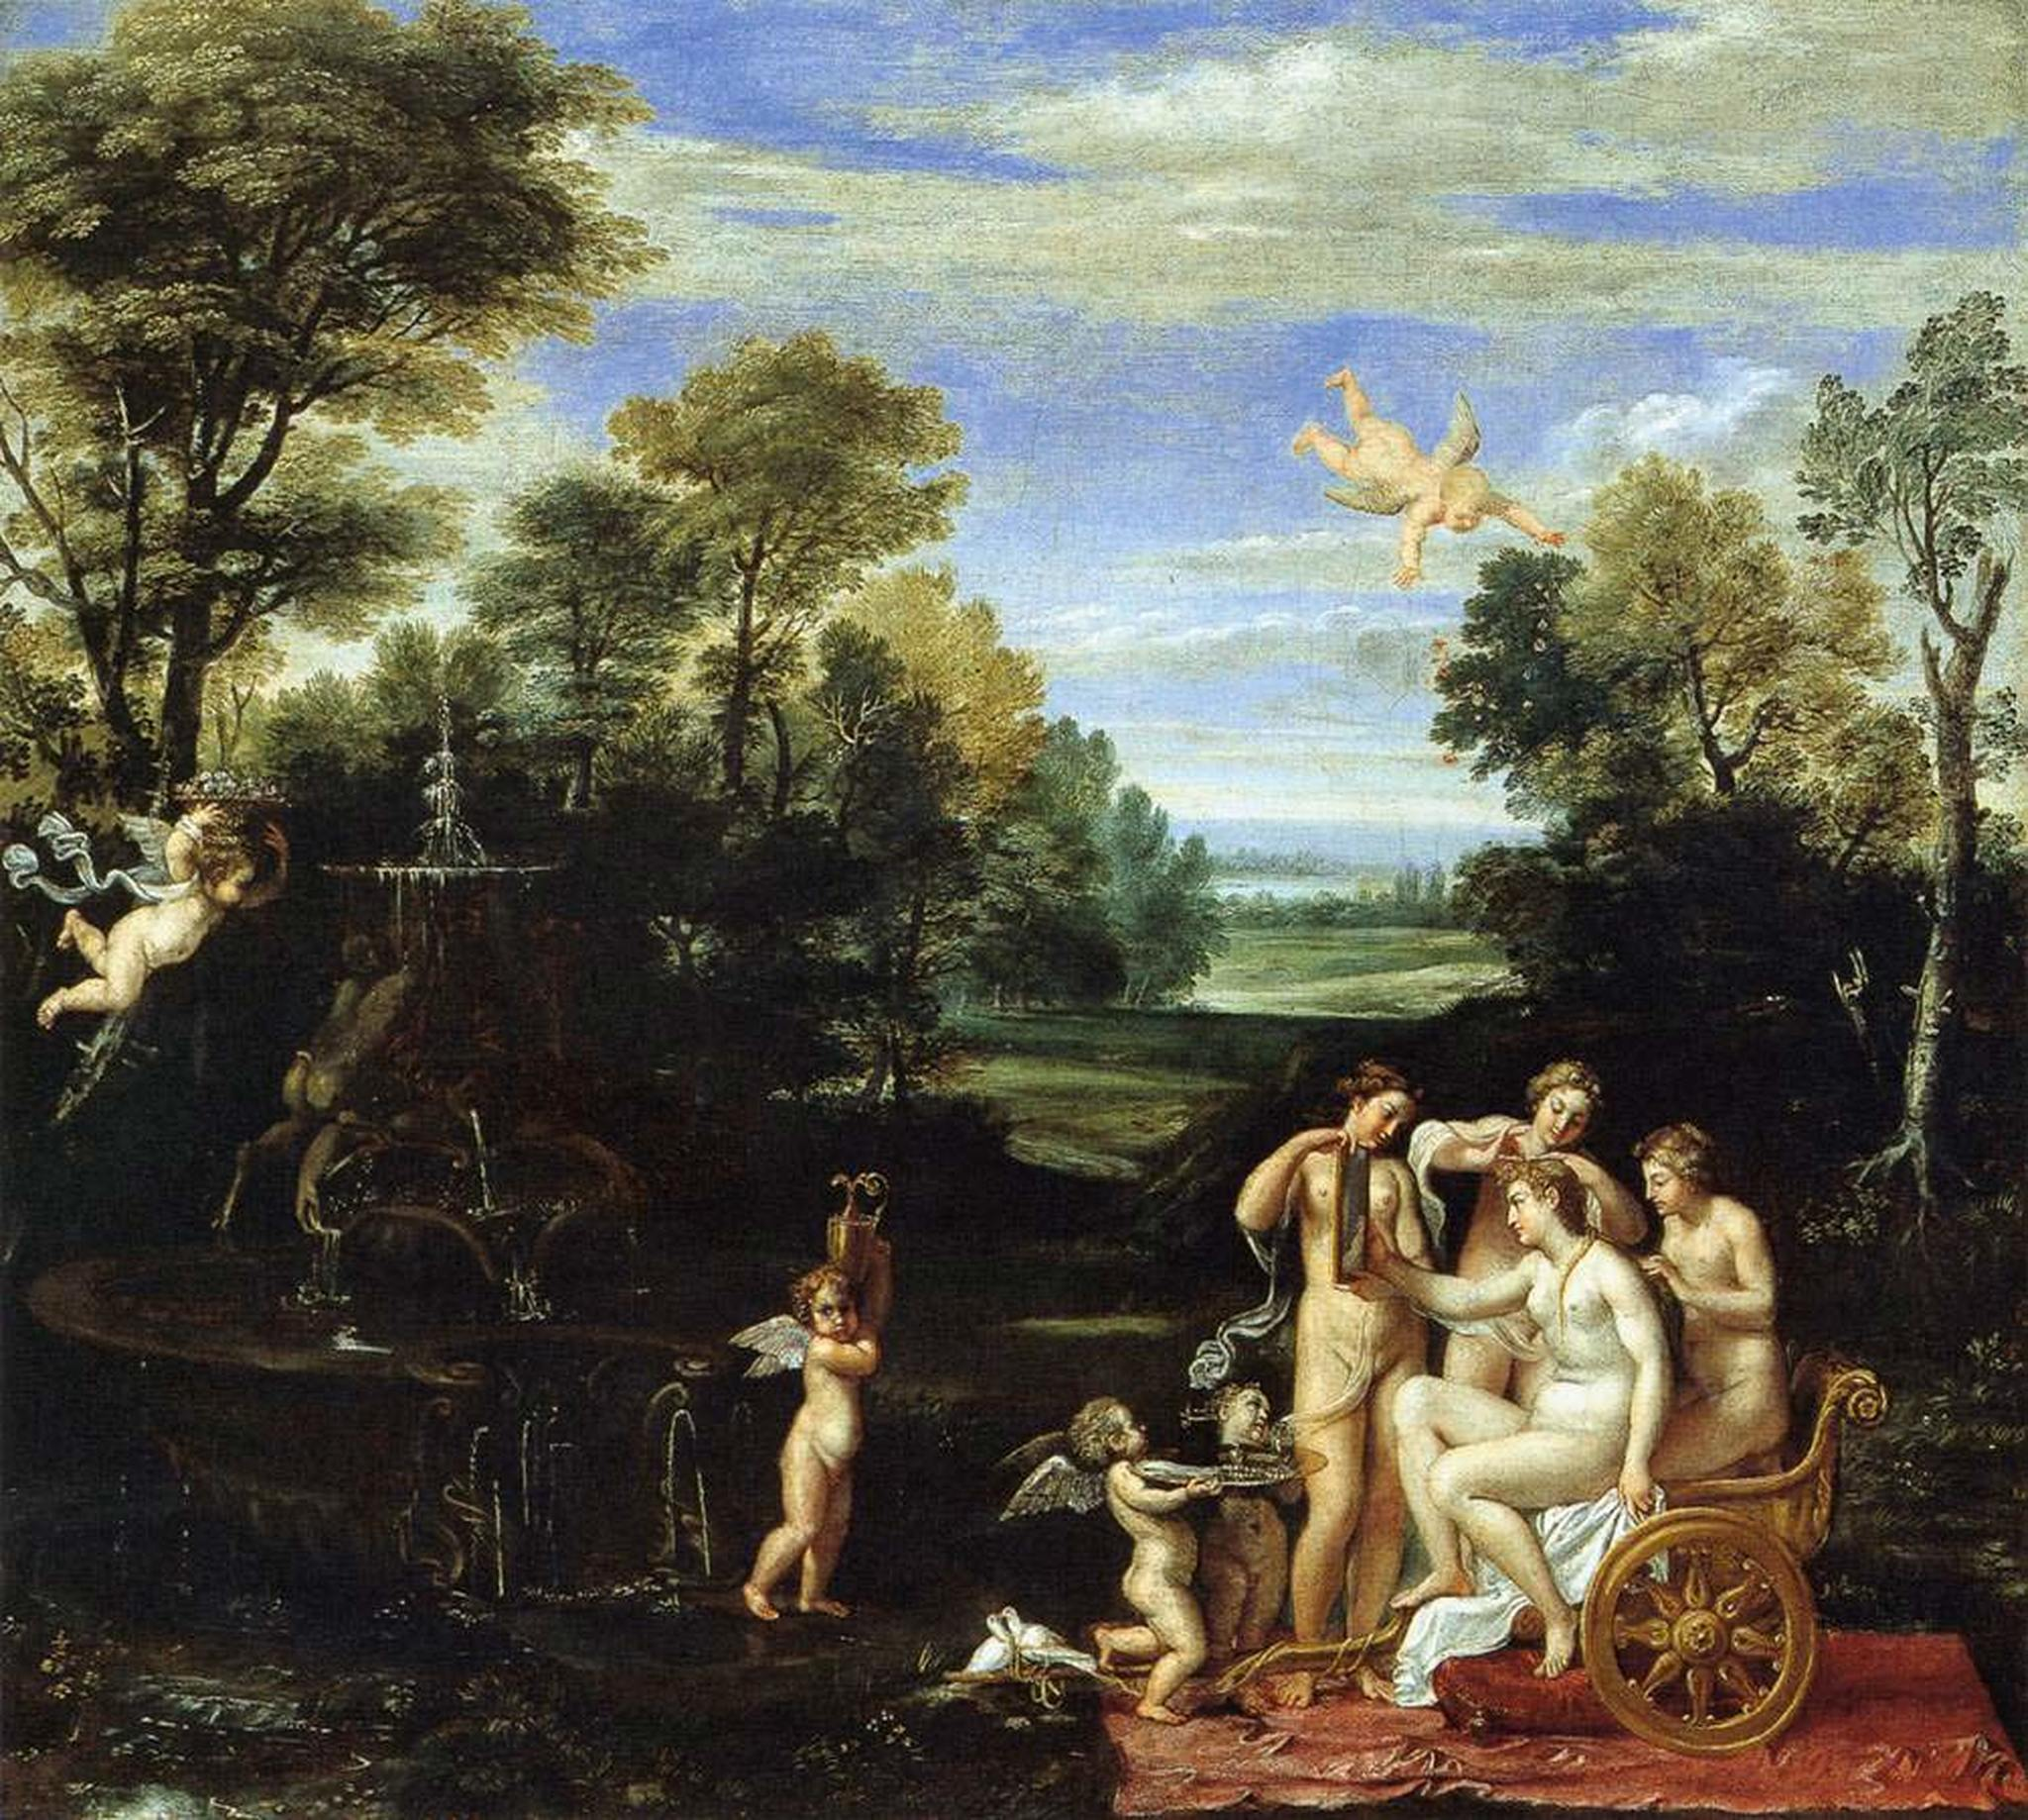 Annibale_Carracci 1605 Landscape-with-the-Toilet-of-Venus Pinacoteca Nazionale Bologna,